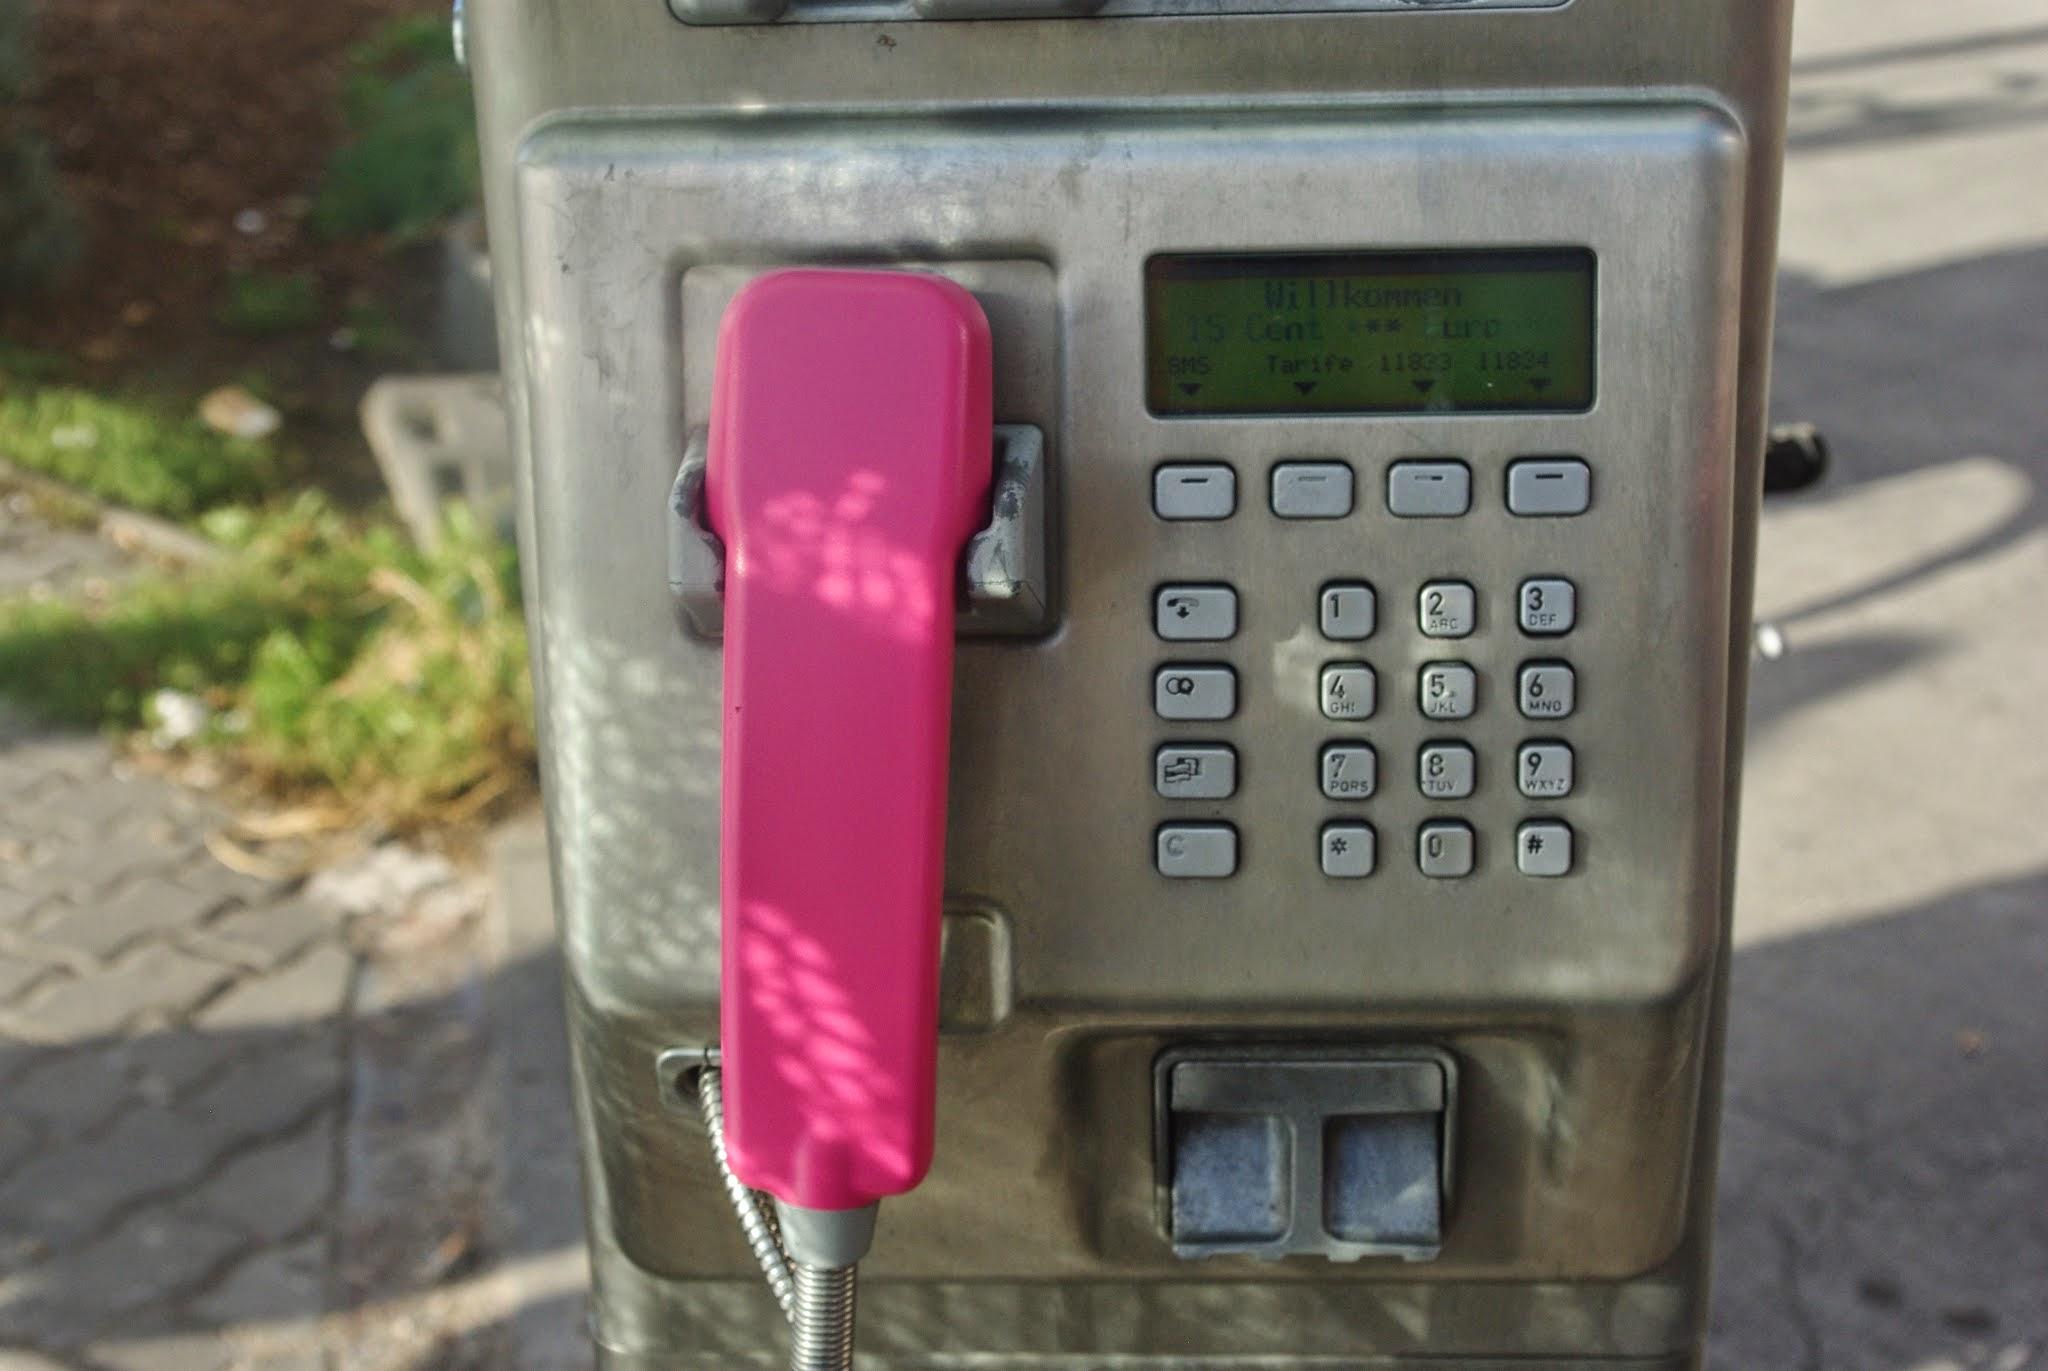 A bright pink payphone in Prenzlauer Berg, Berlin.